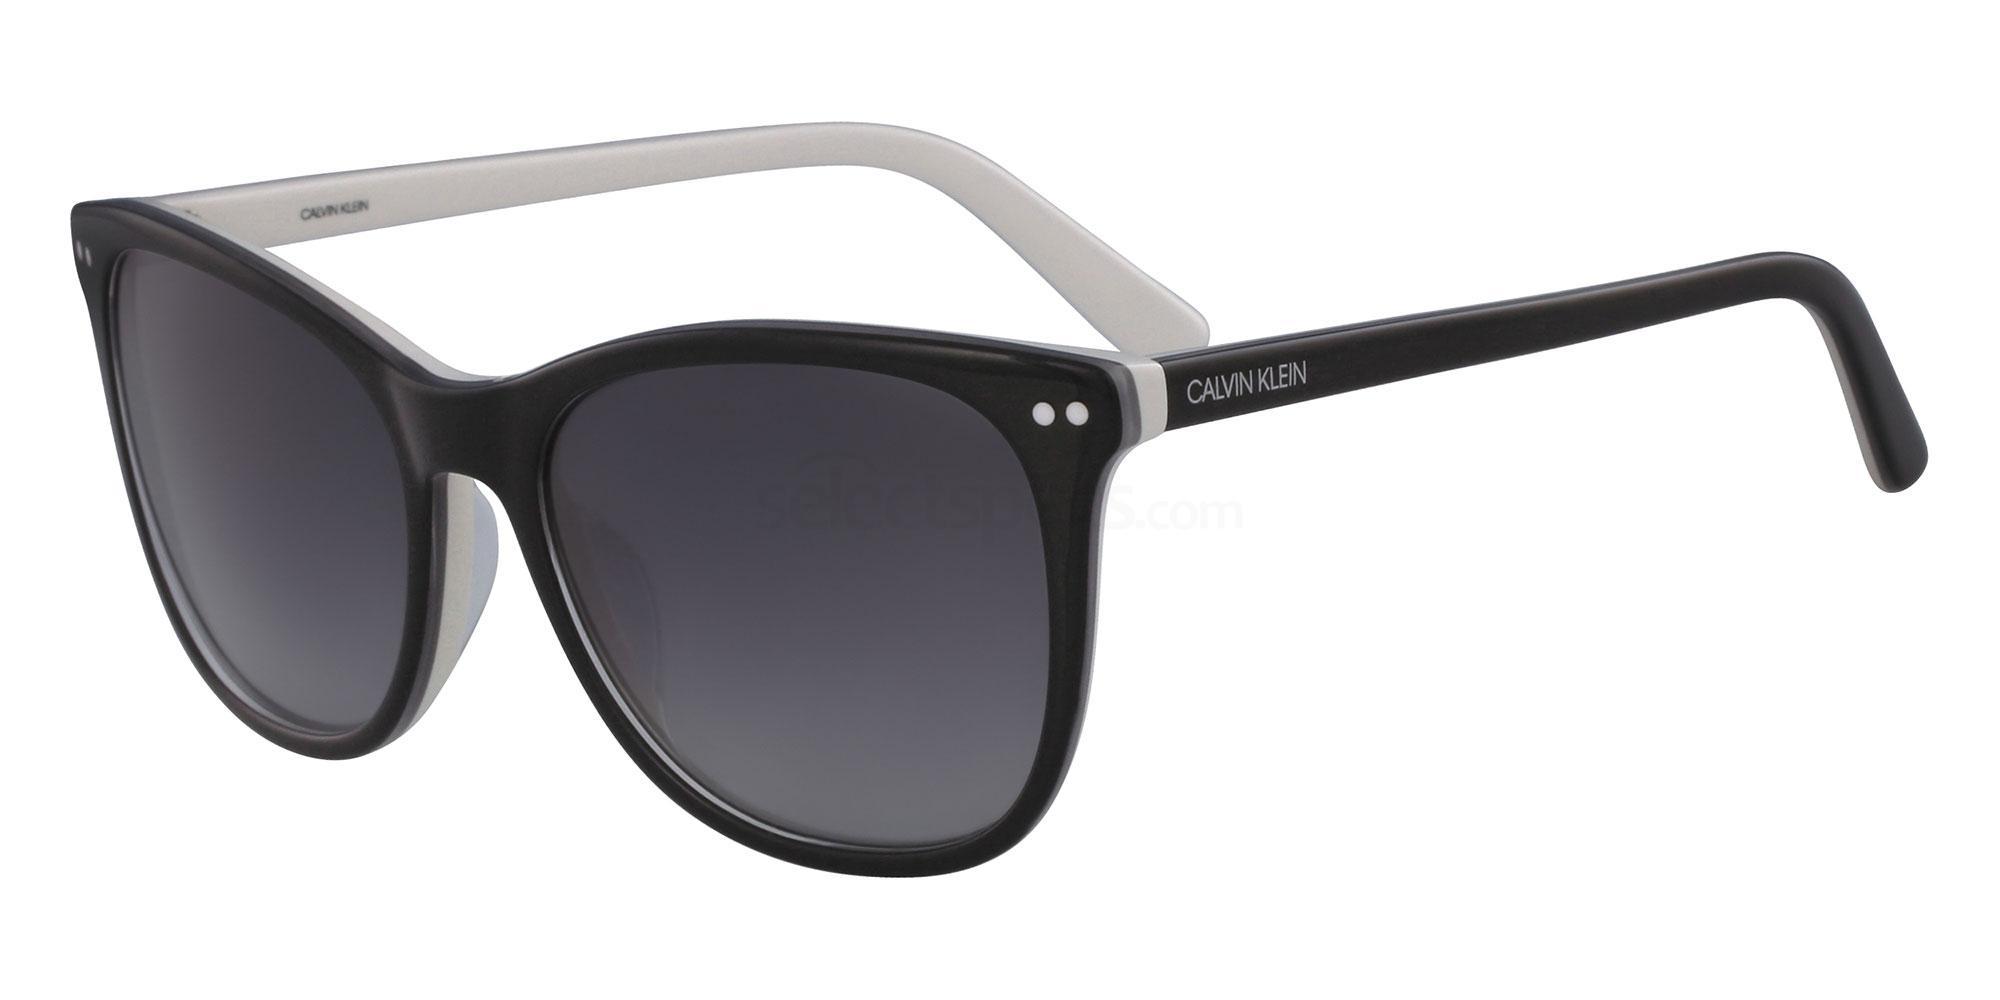 002 CK18510S Sunglasses, Calvin Klein